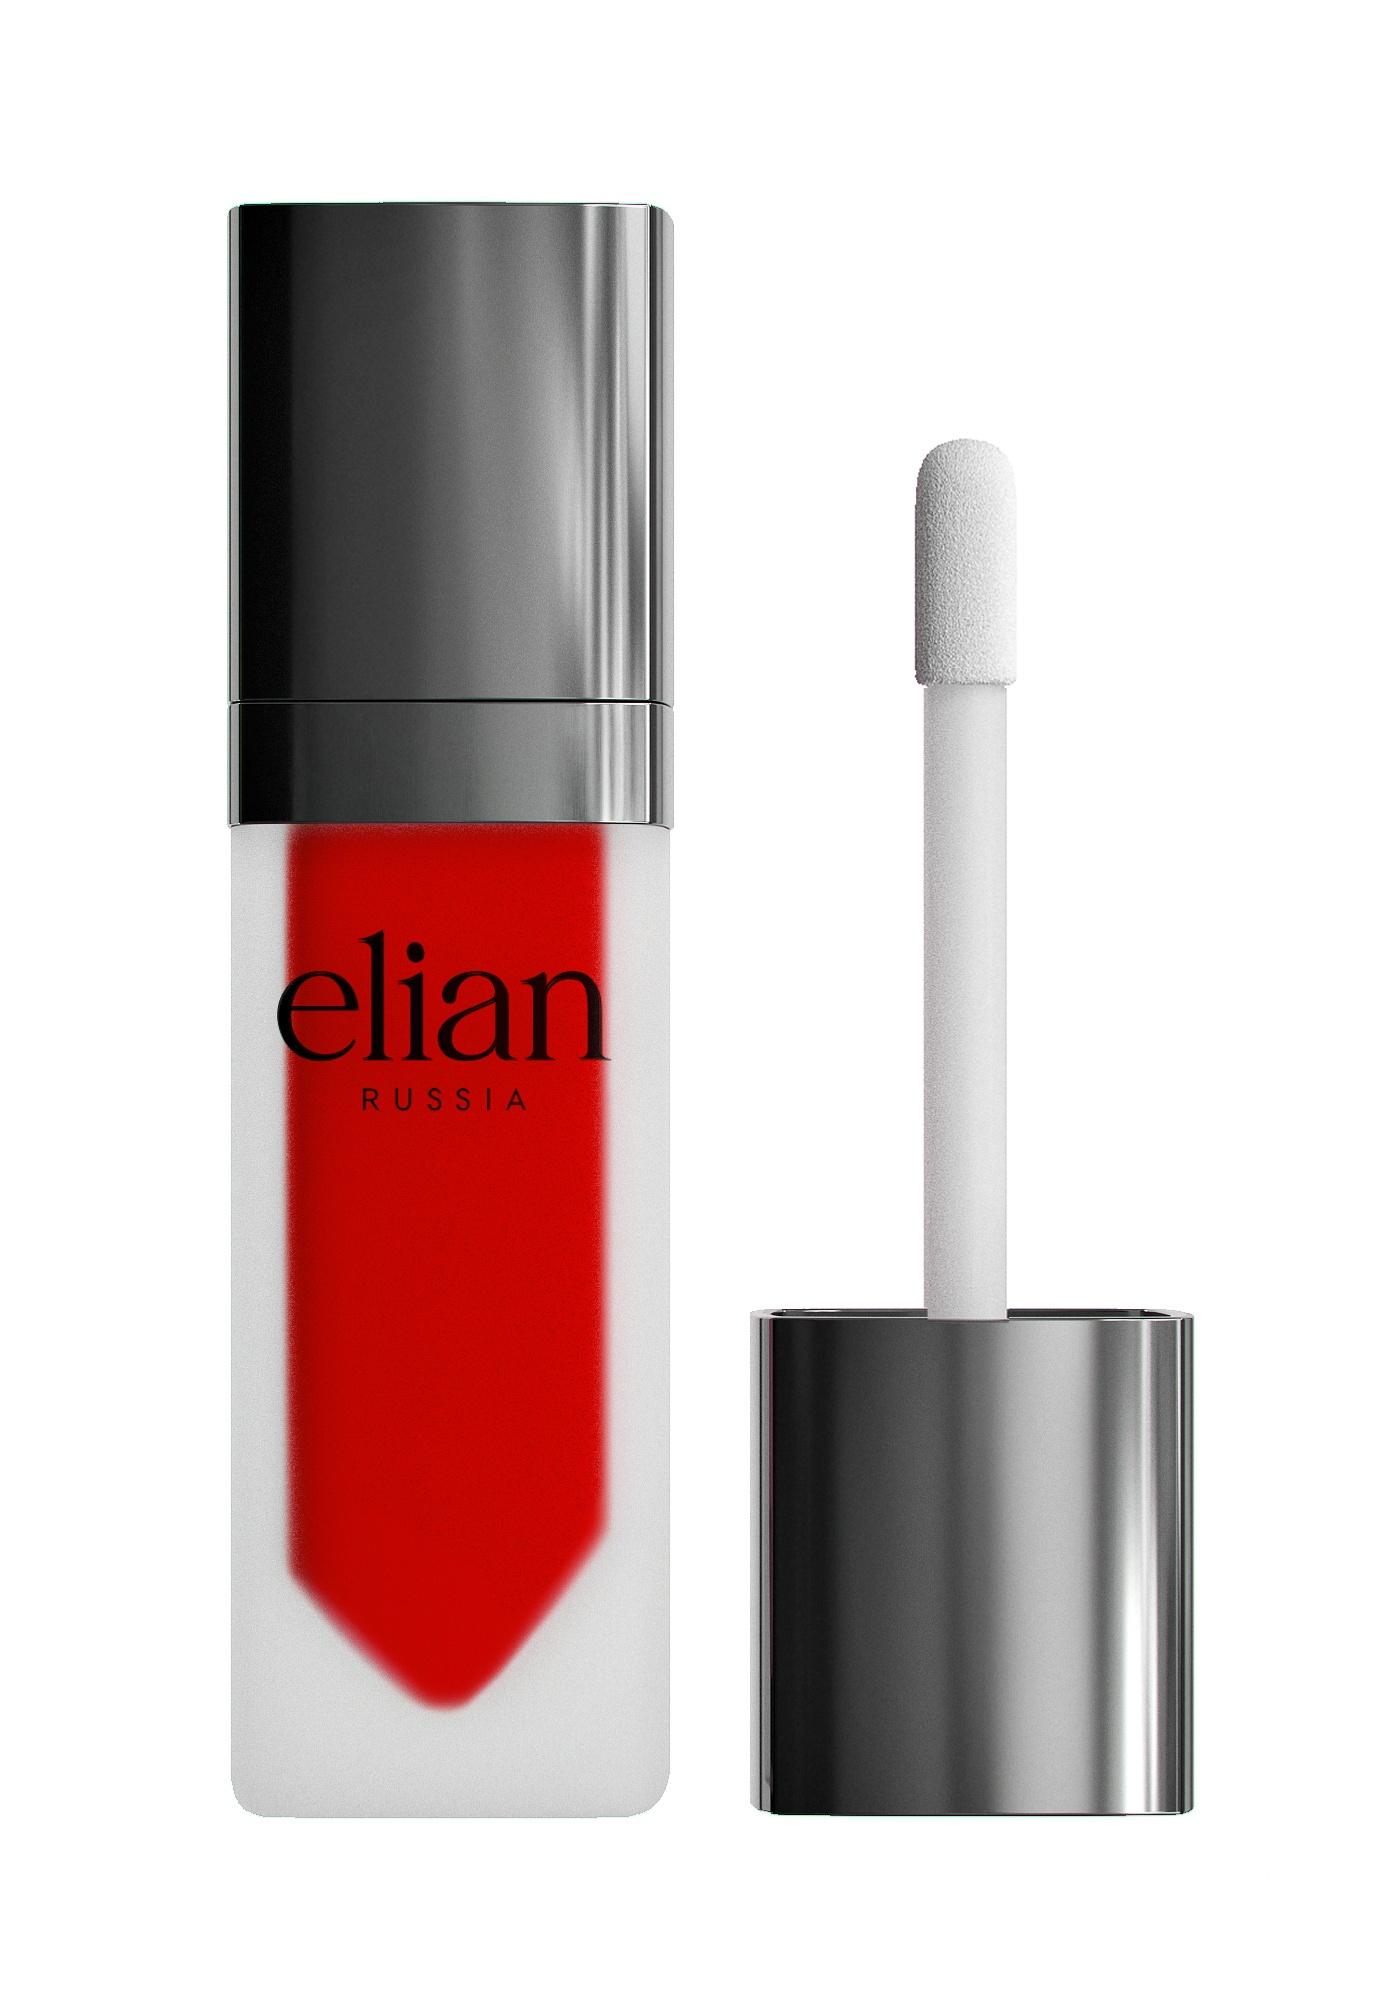 Жидкая матовая помада Superior matte liquid lipstick 608 Cherry Orchad ELIAN RUSSIA